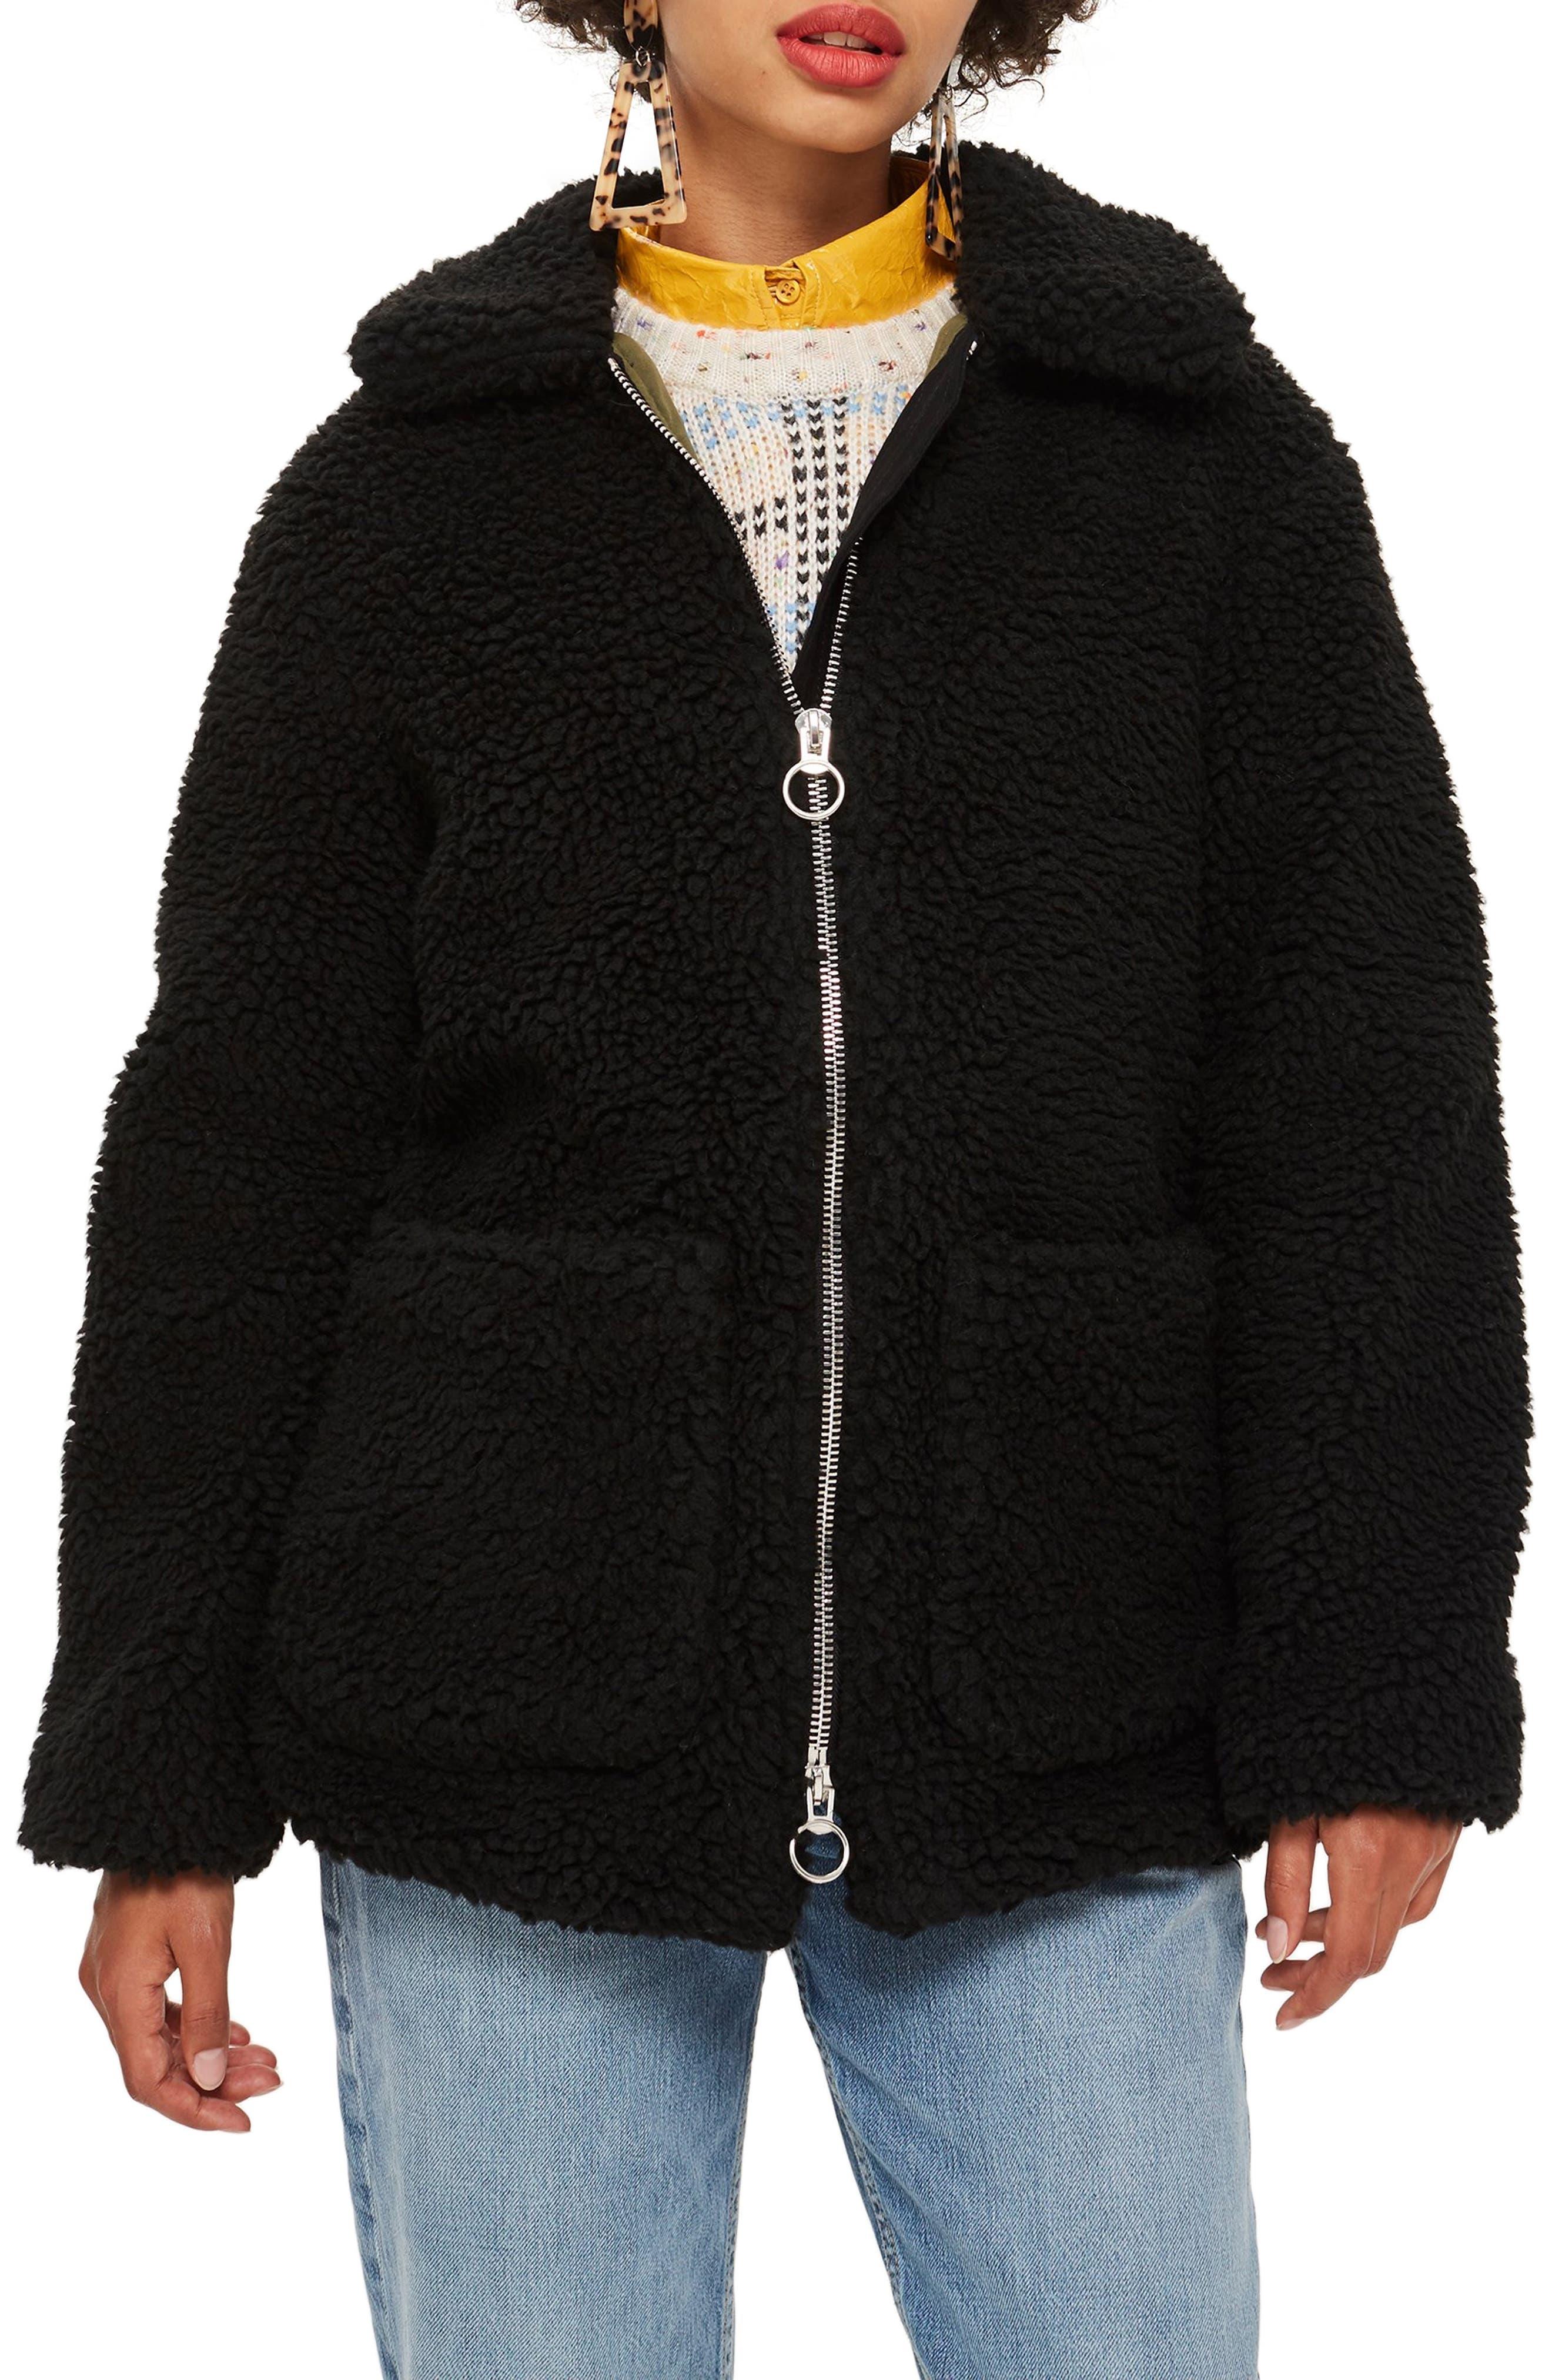 Borg Jacket,                             Main thumbnail 1, color,                             BLACK